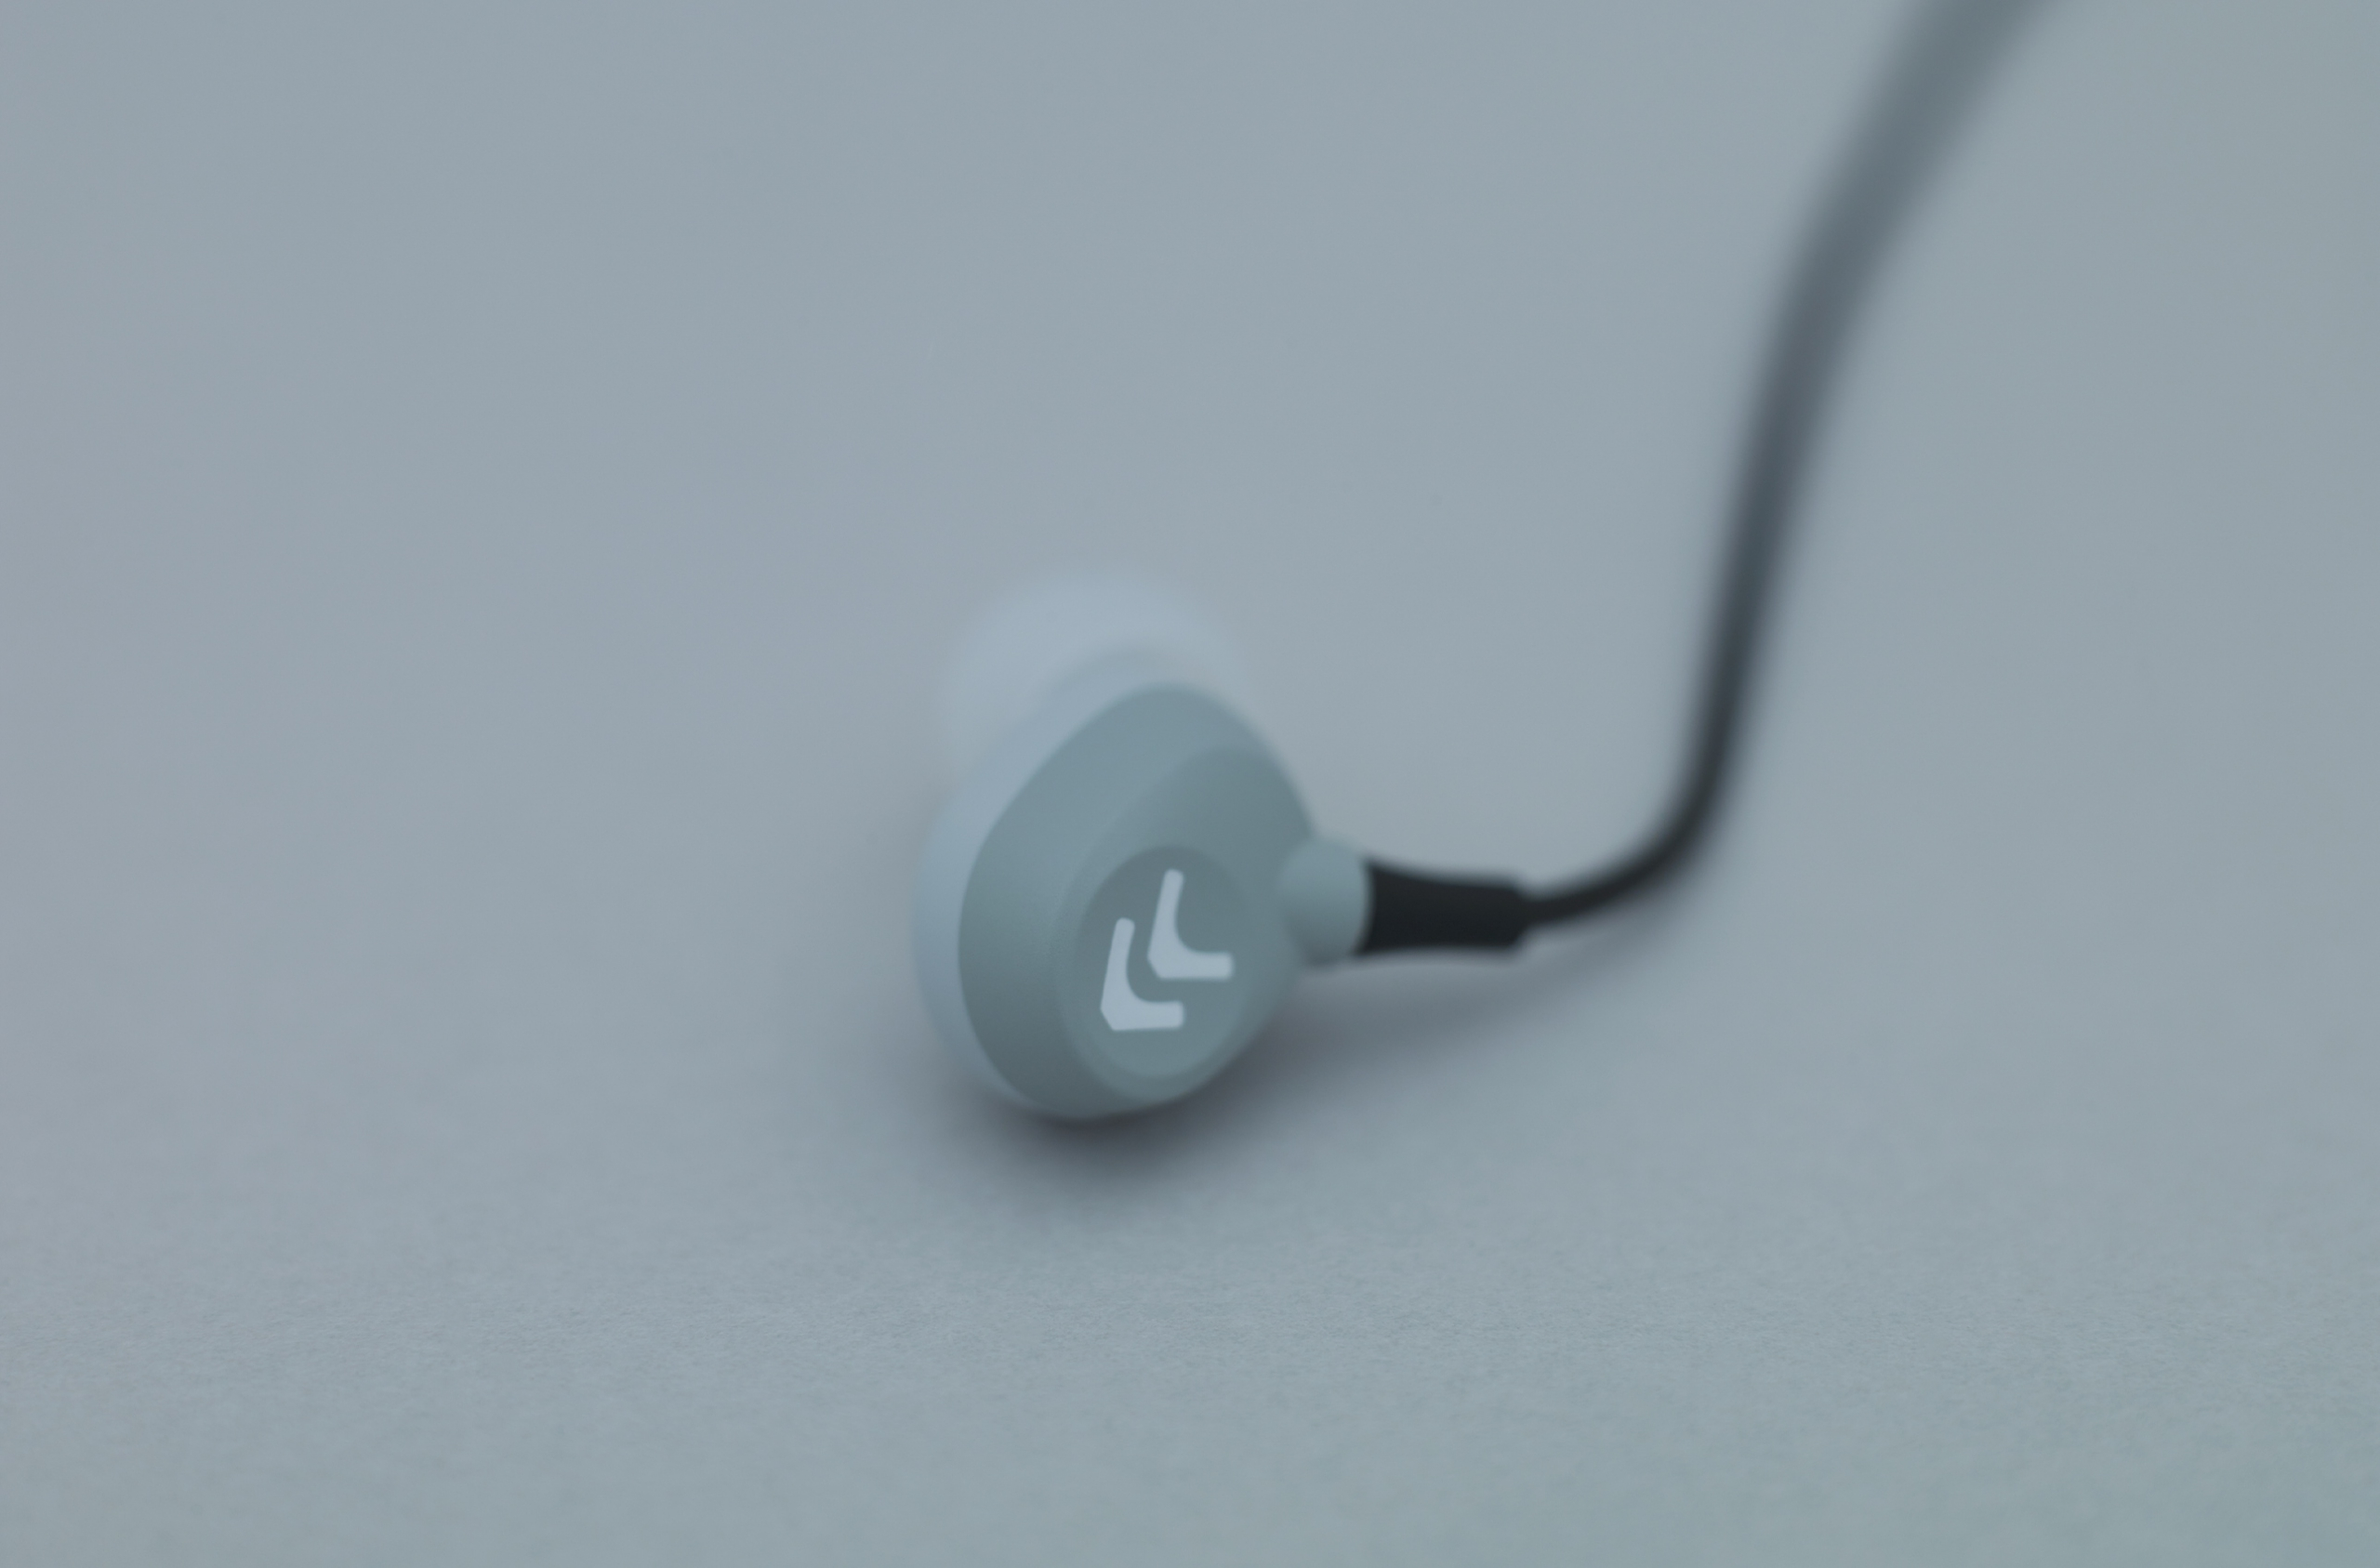 CR-S1 / Canal type earphone